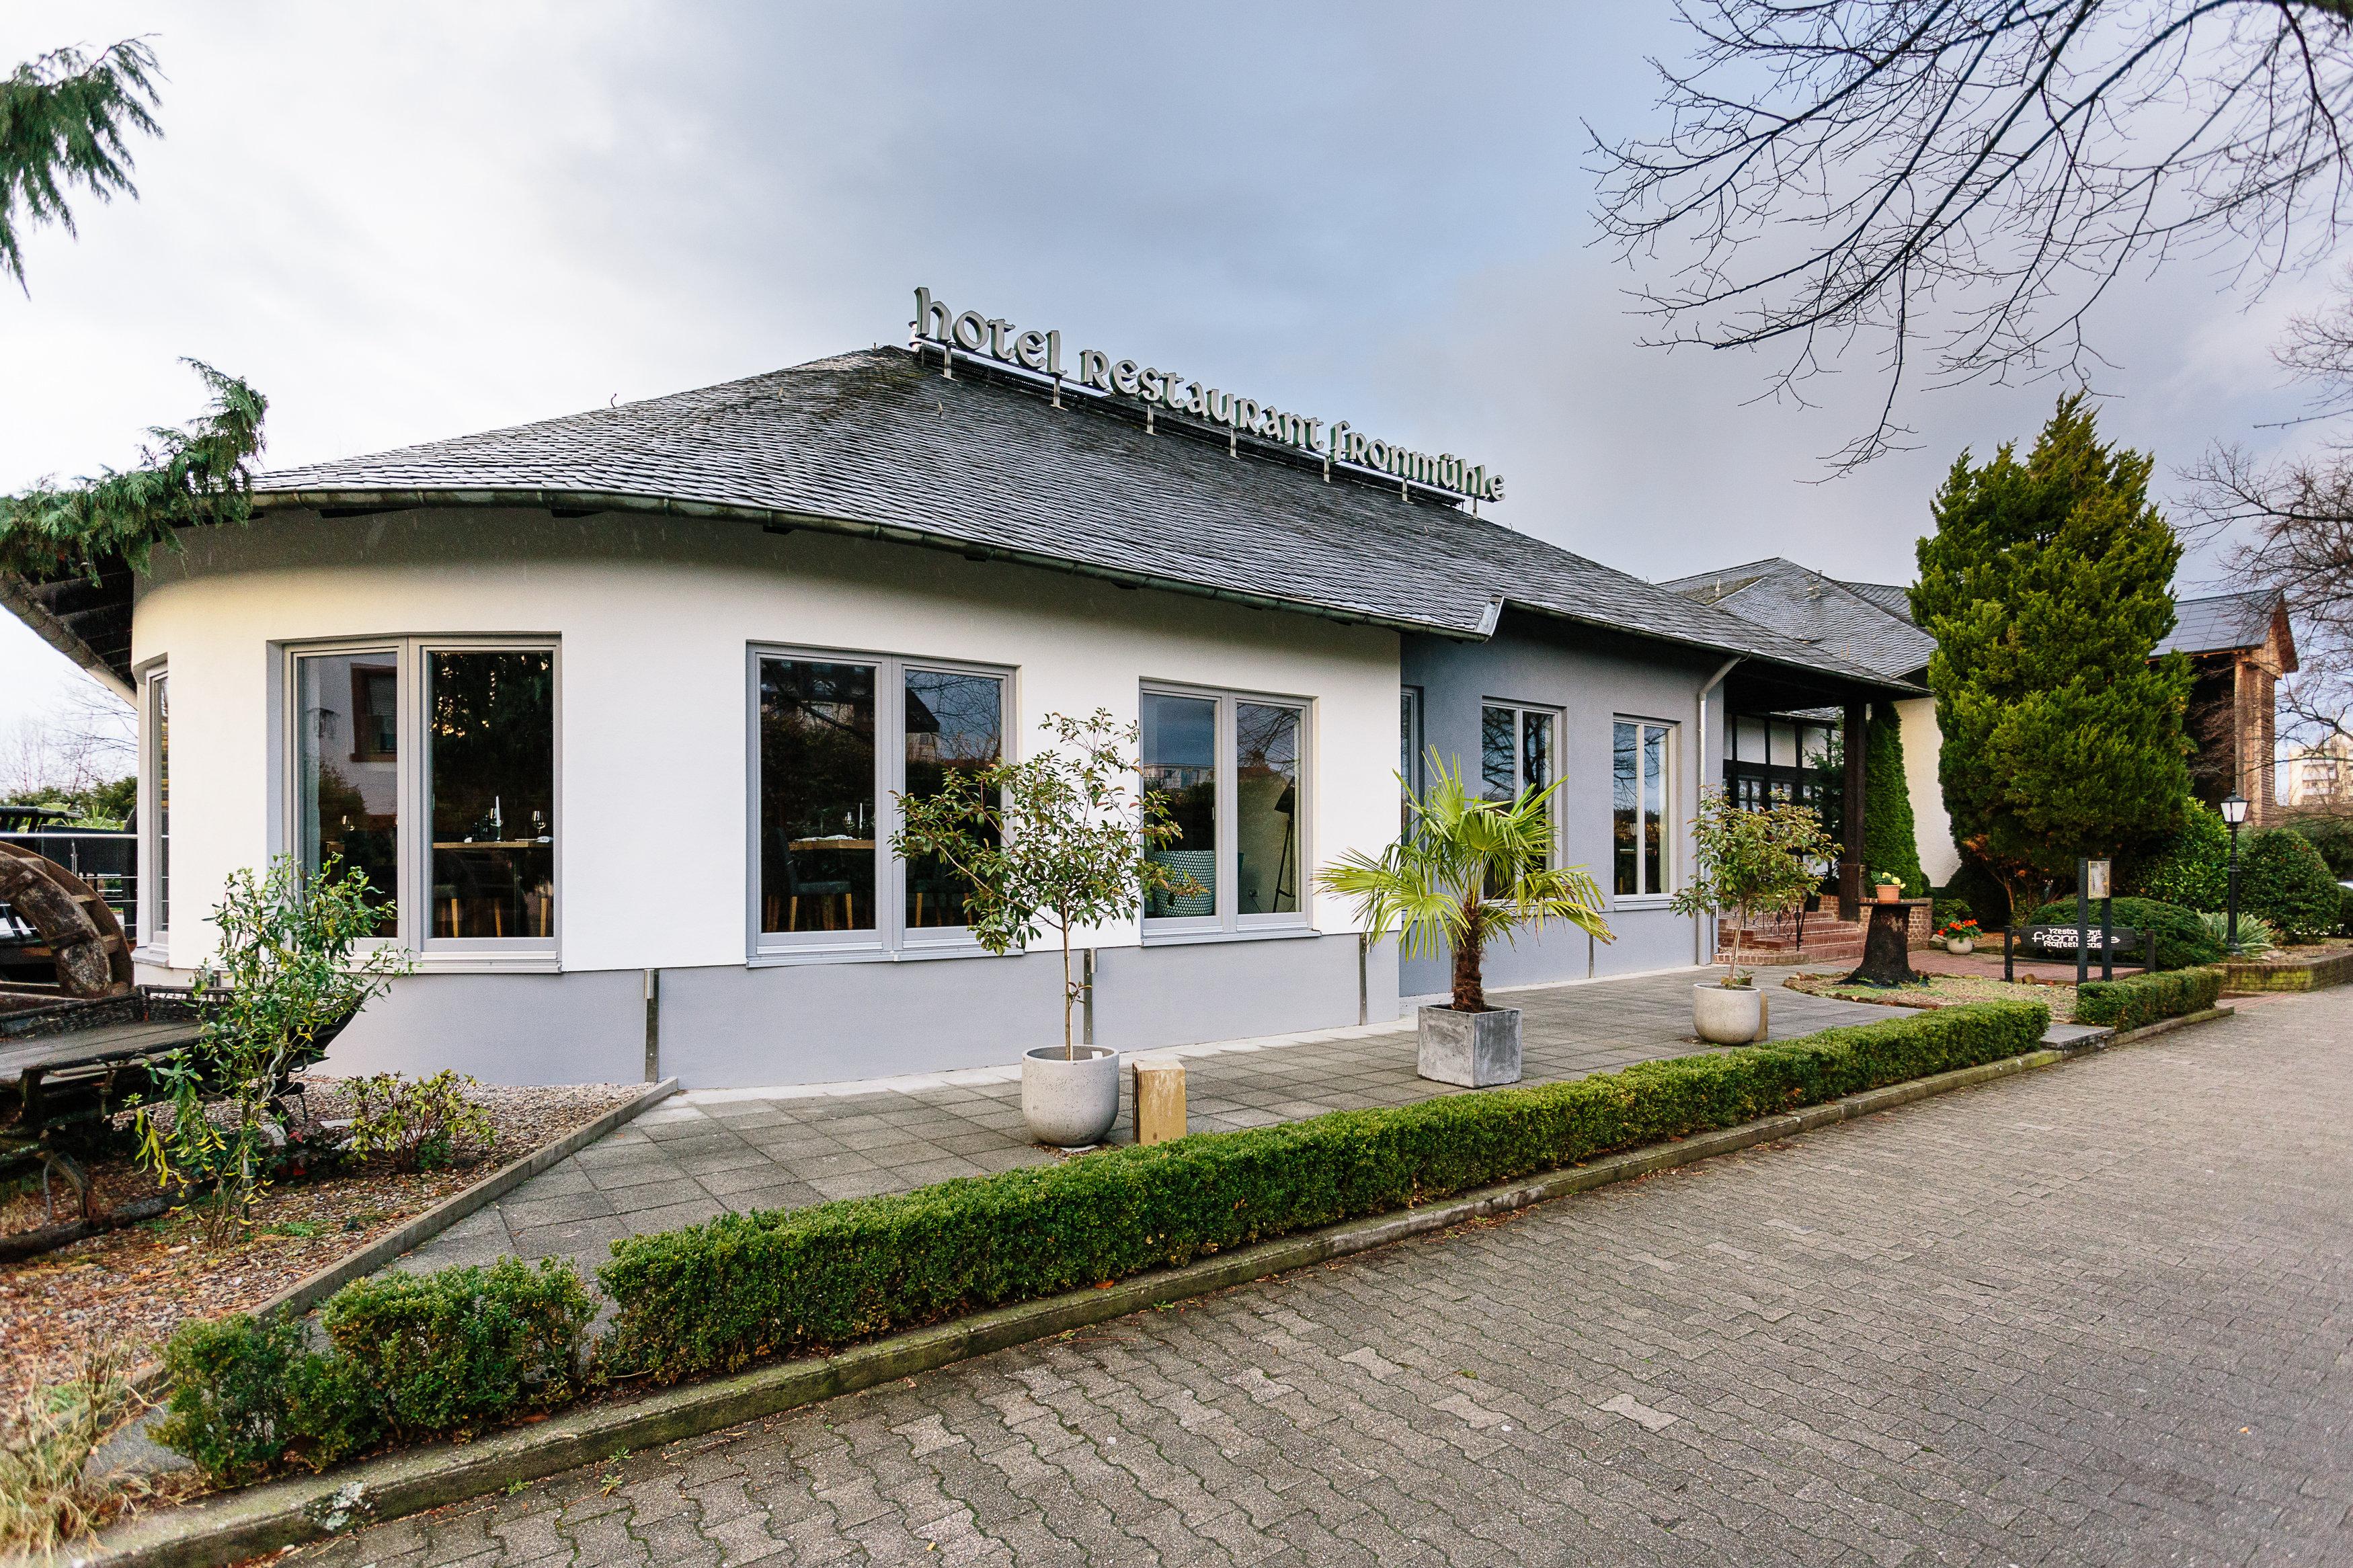 Hotel Fronmühle in Bad Dürkheim – HOTEL DE